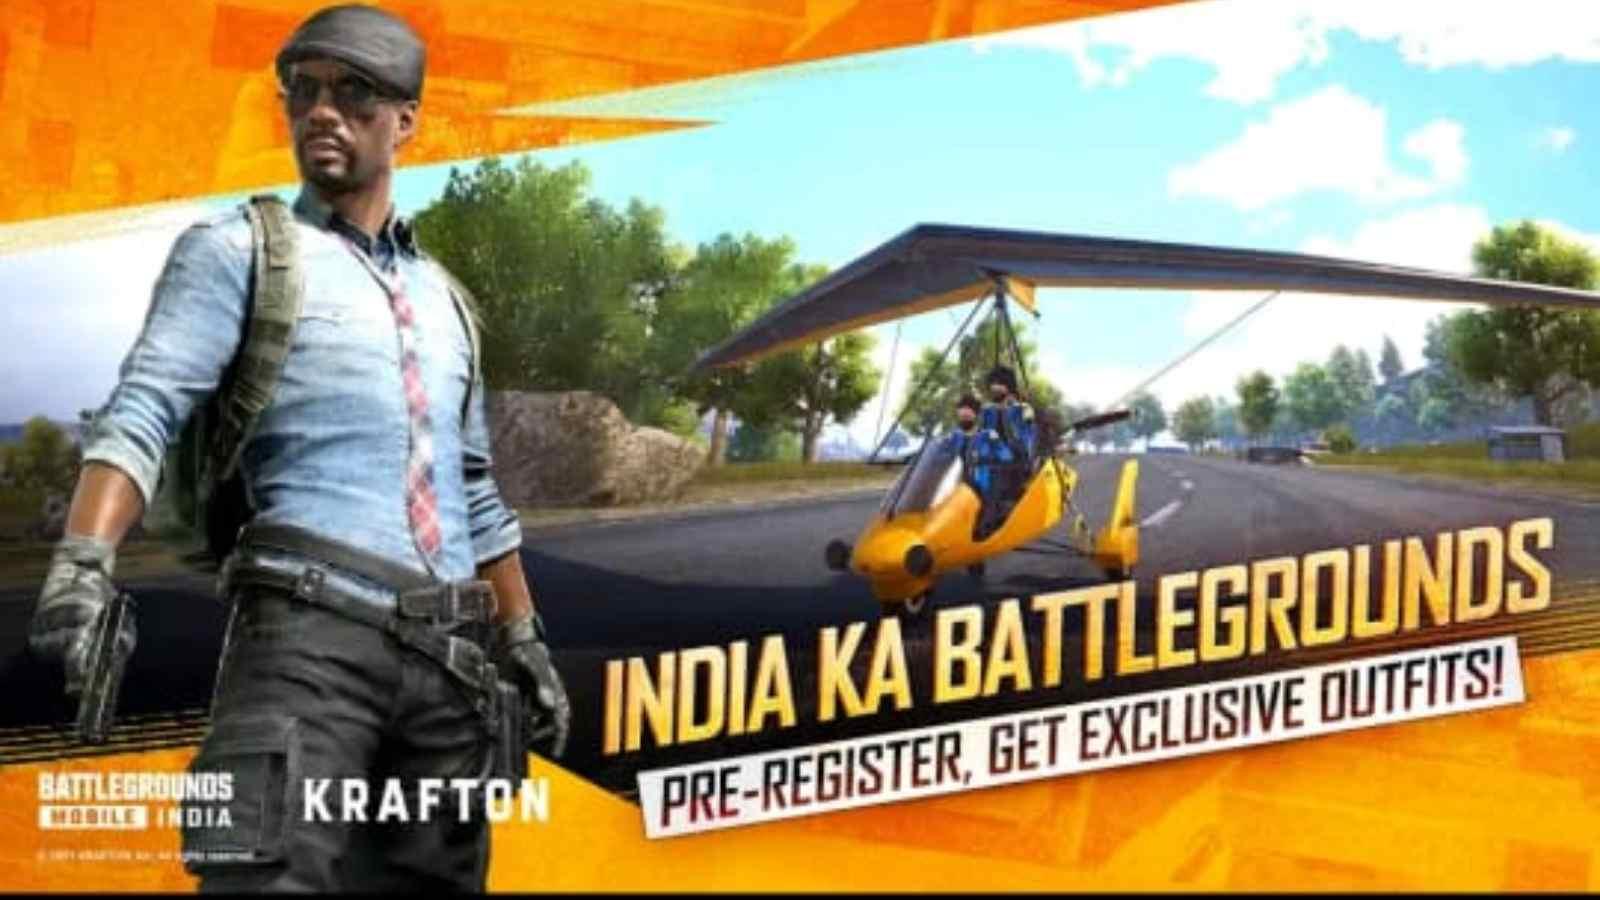 Battlegrounds Mobile India Pre-Registration